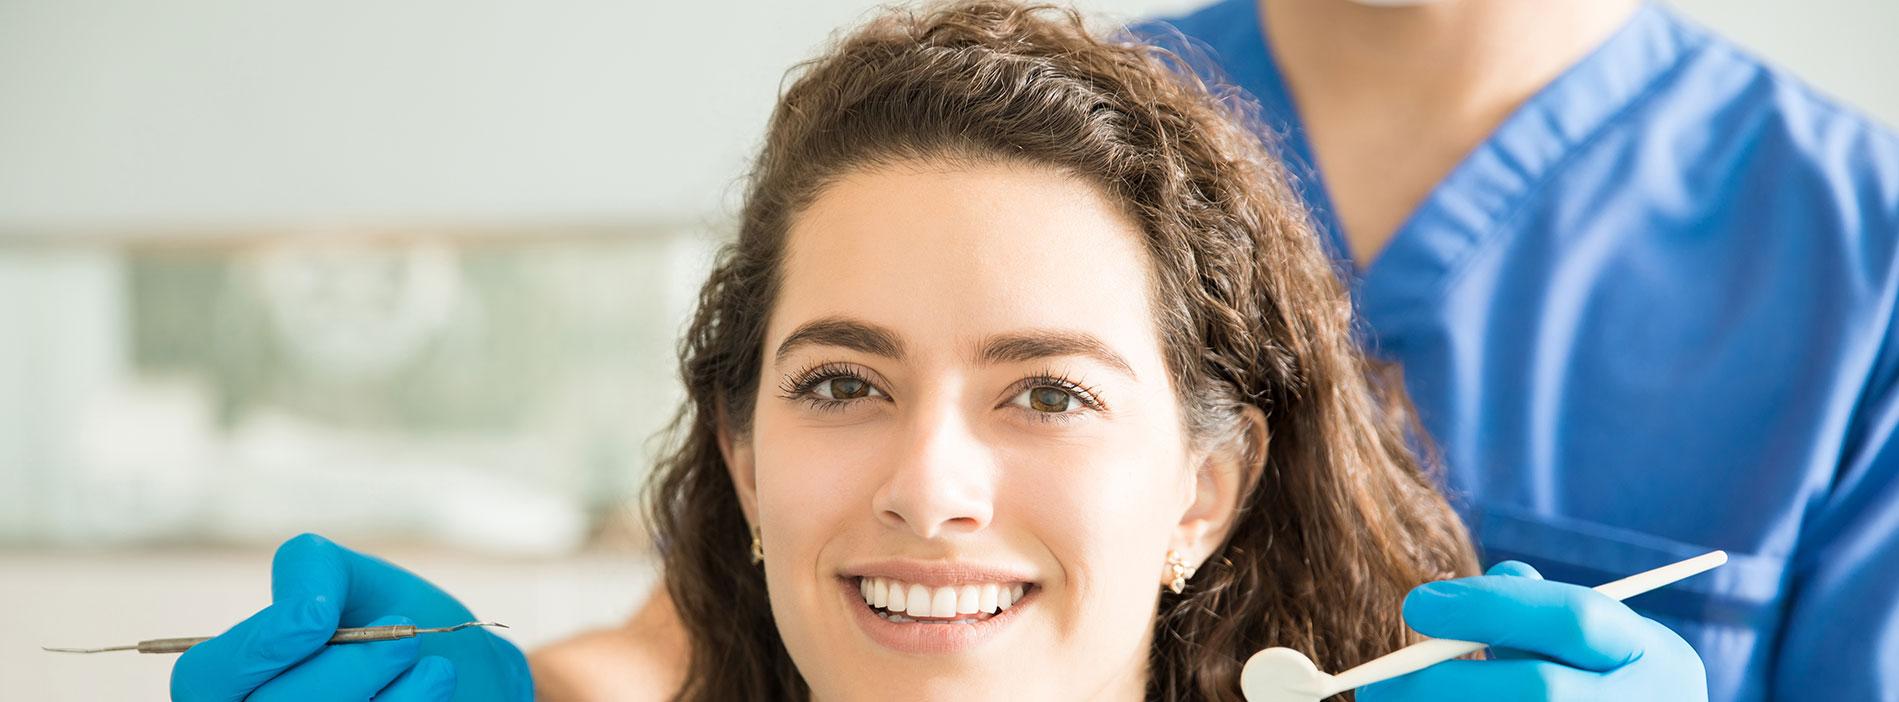 Woman smiling with the dental veneers